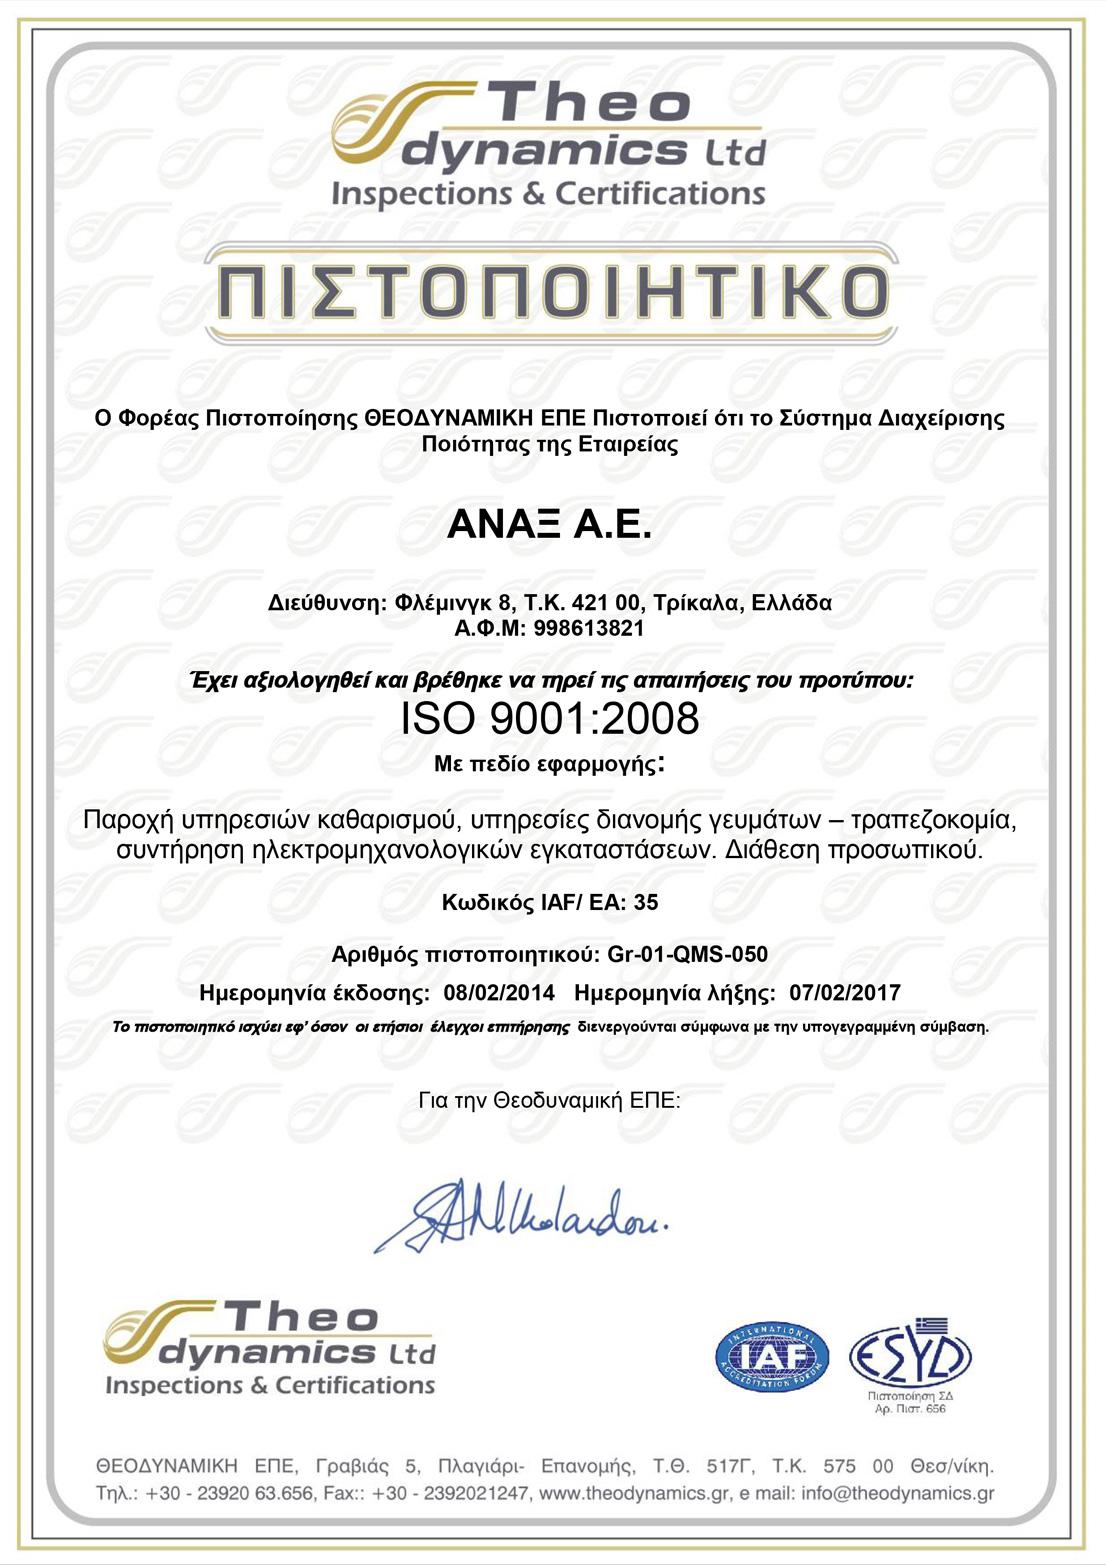 pdf-iso-9001-2008